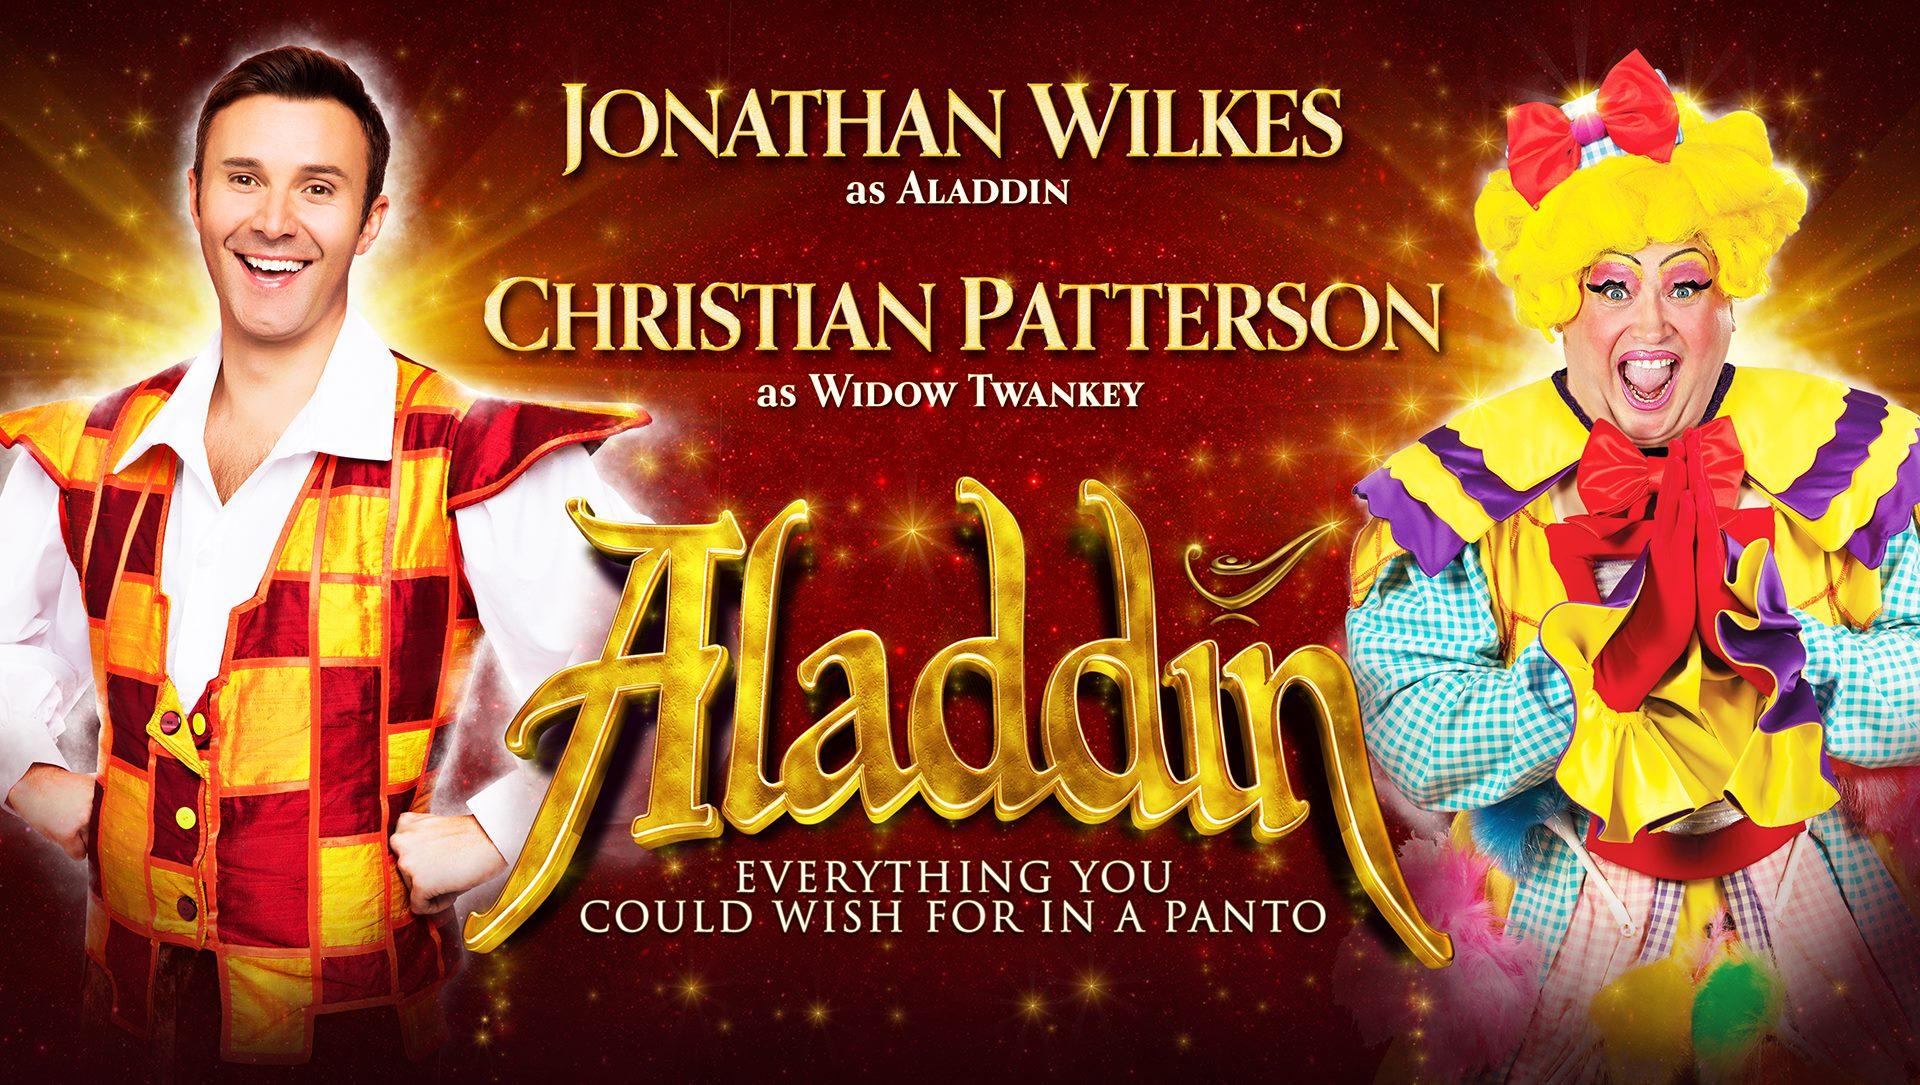 Aladdin regent theatre stoke for Aladdin cuisine stoke